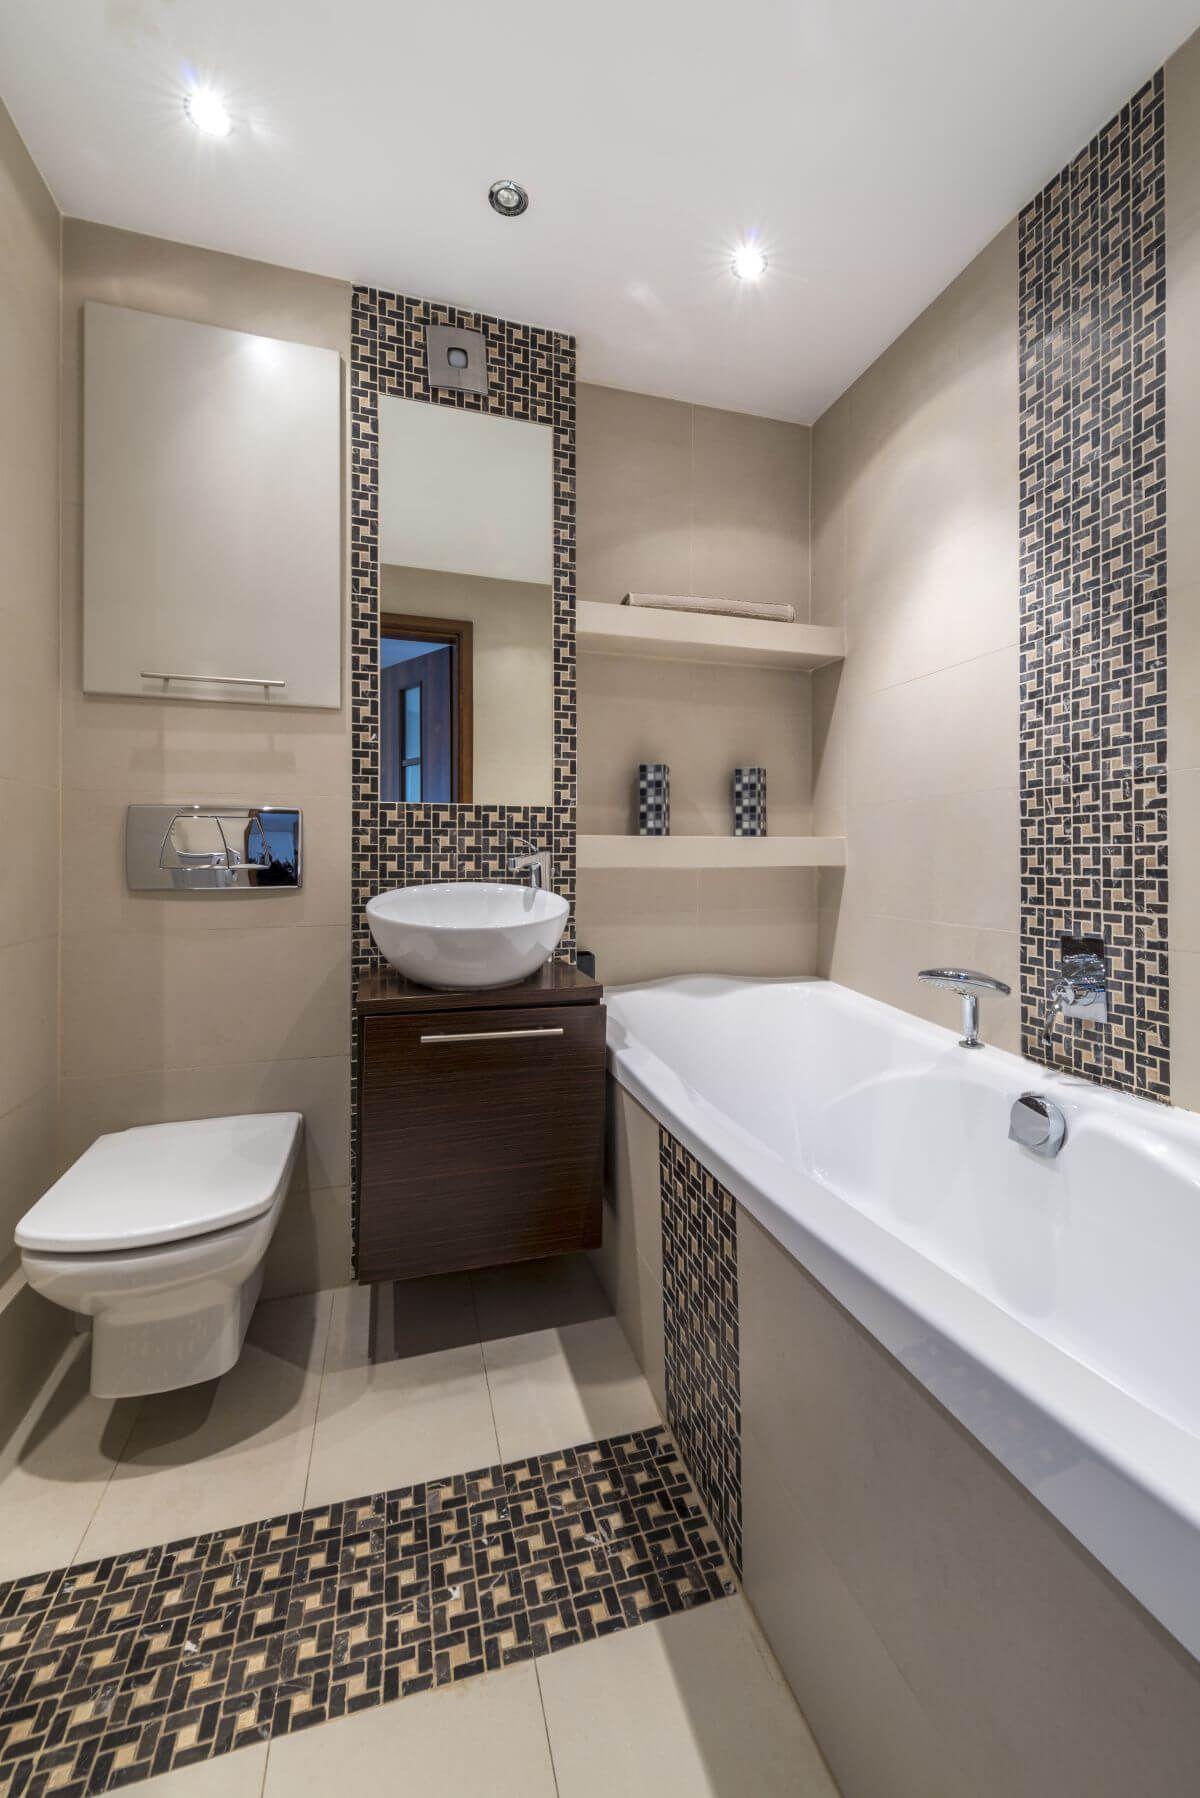 Small bathroom ideas - small bathroom decorating ideas on ... on Simple Bathroom Designs For Small Spaces  id=85445